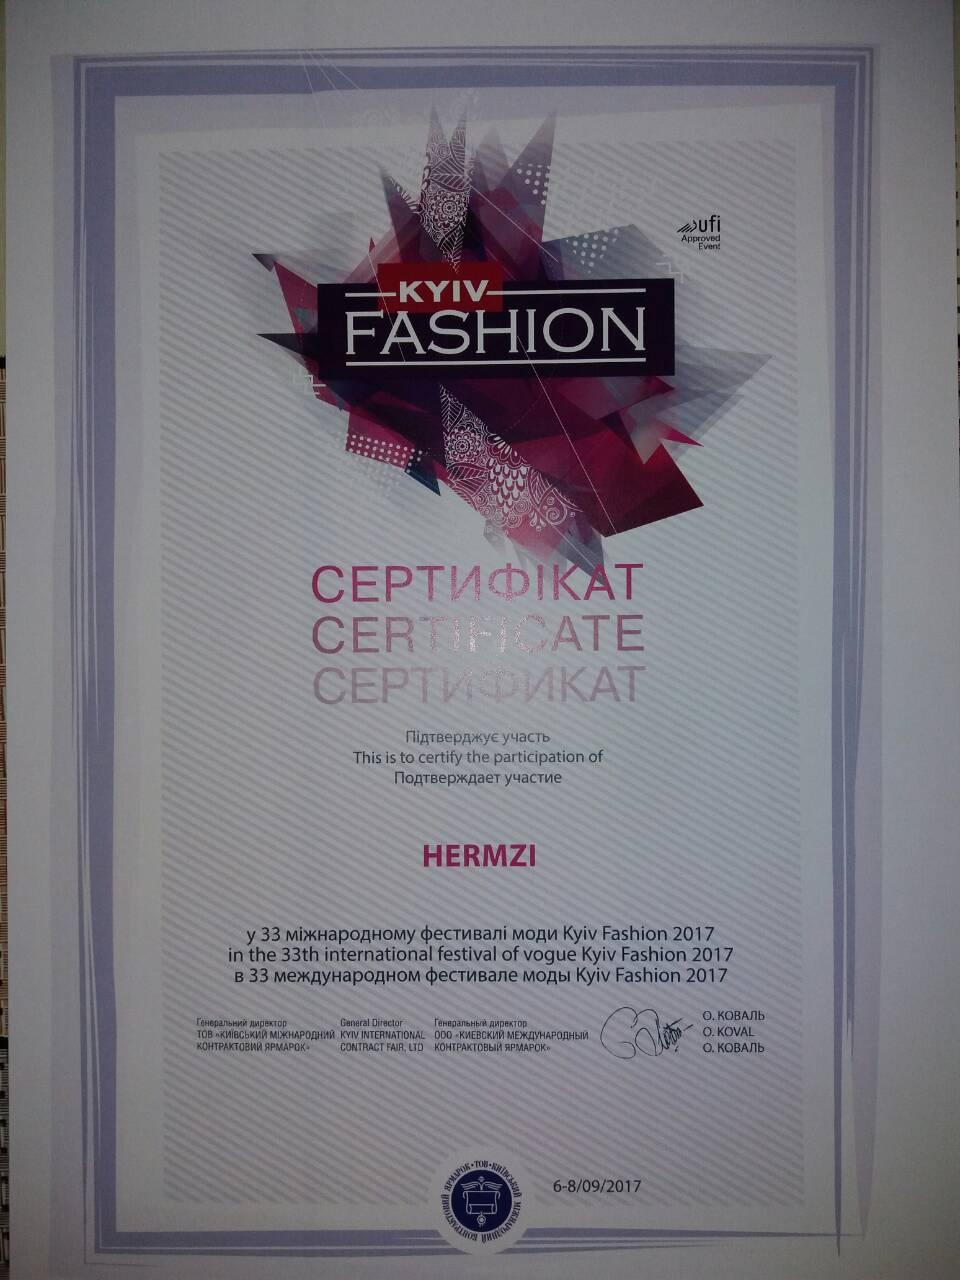 Сертификат качества Kyiv Fashion 2017